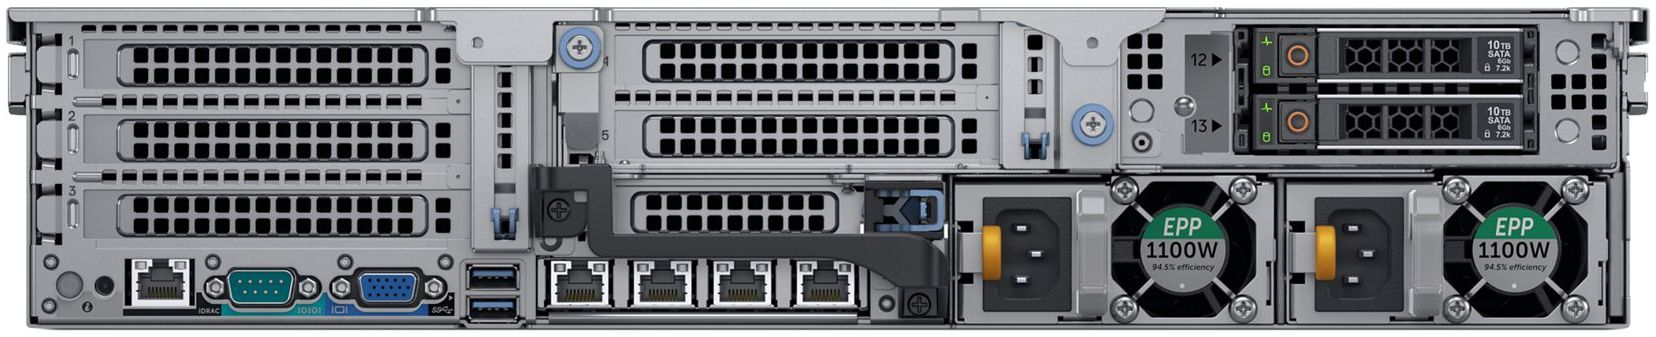 Dell EMC VxRail S-Series Rear